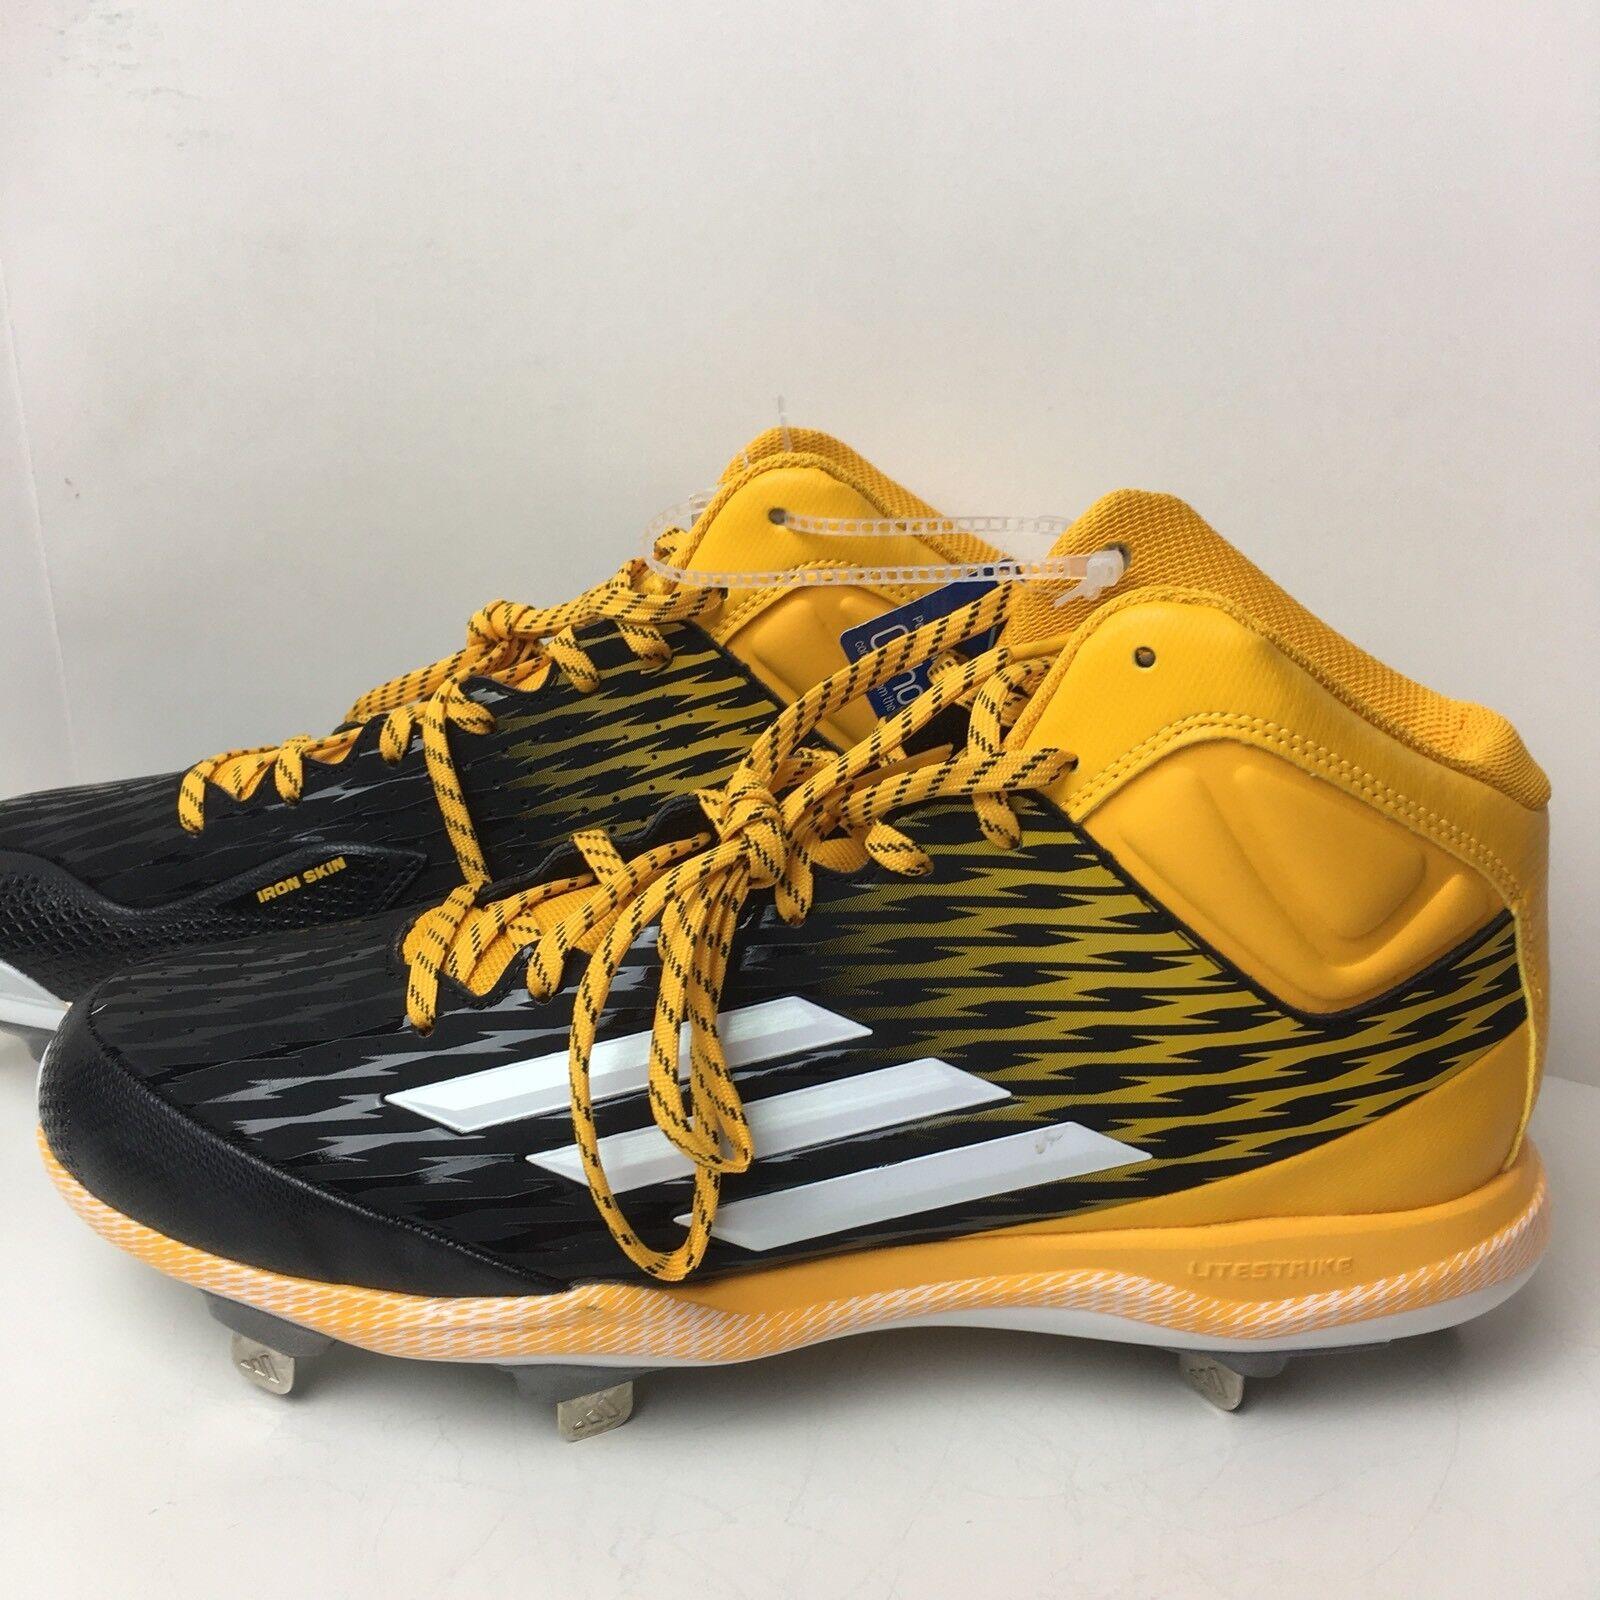 New Adidas Mens Yellow Power Ally 3  Baseball Lite Strike Metal Cleats Size 11.5